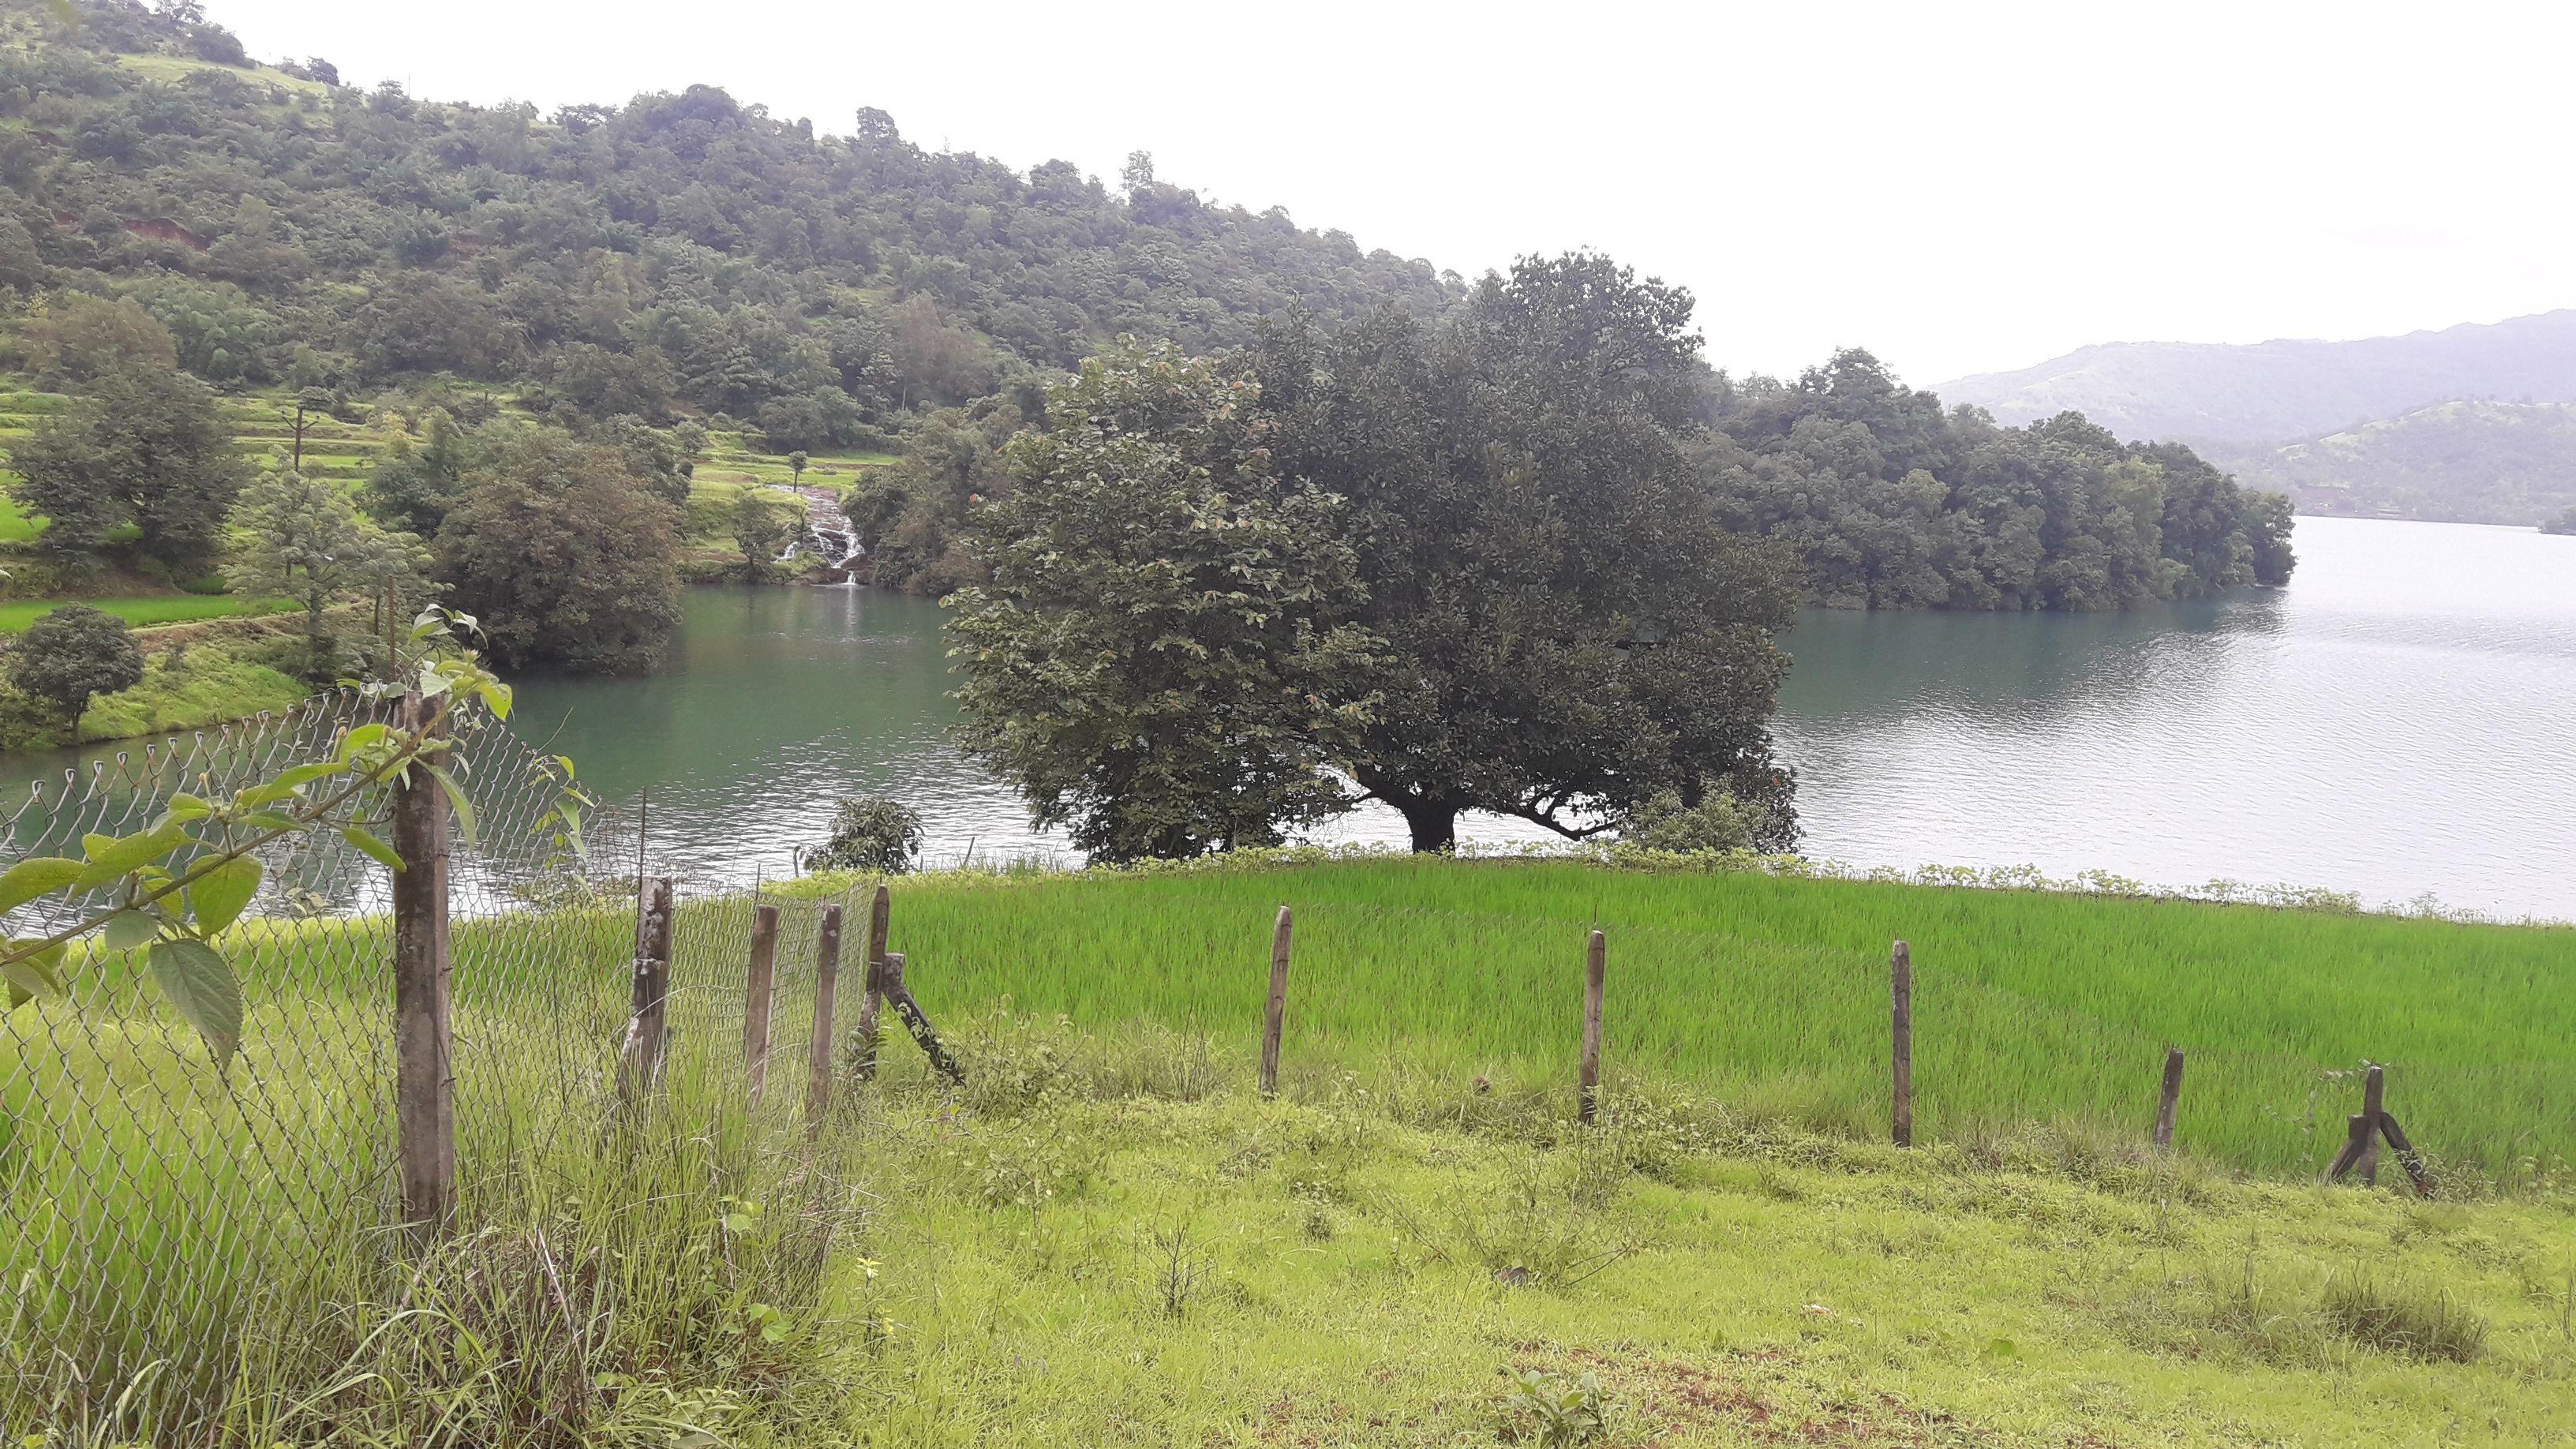 Agricultural Land for sale in Kasedi near Pune